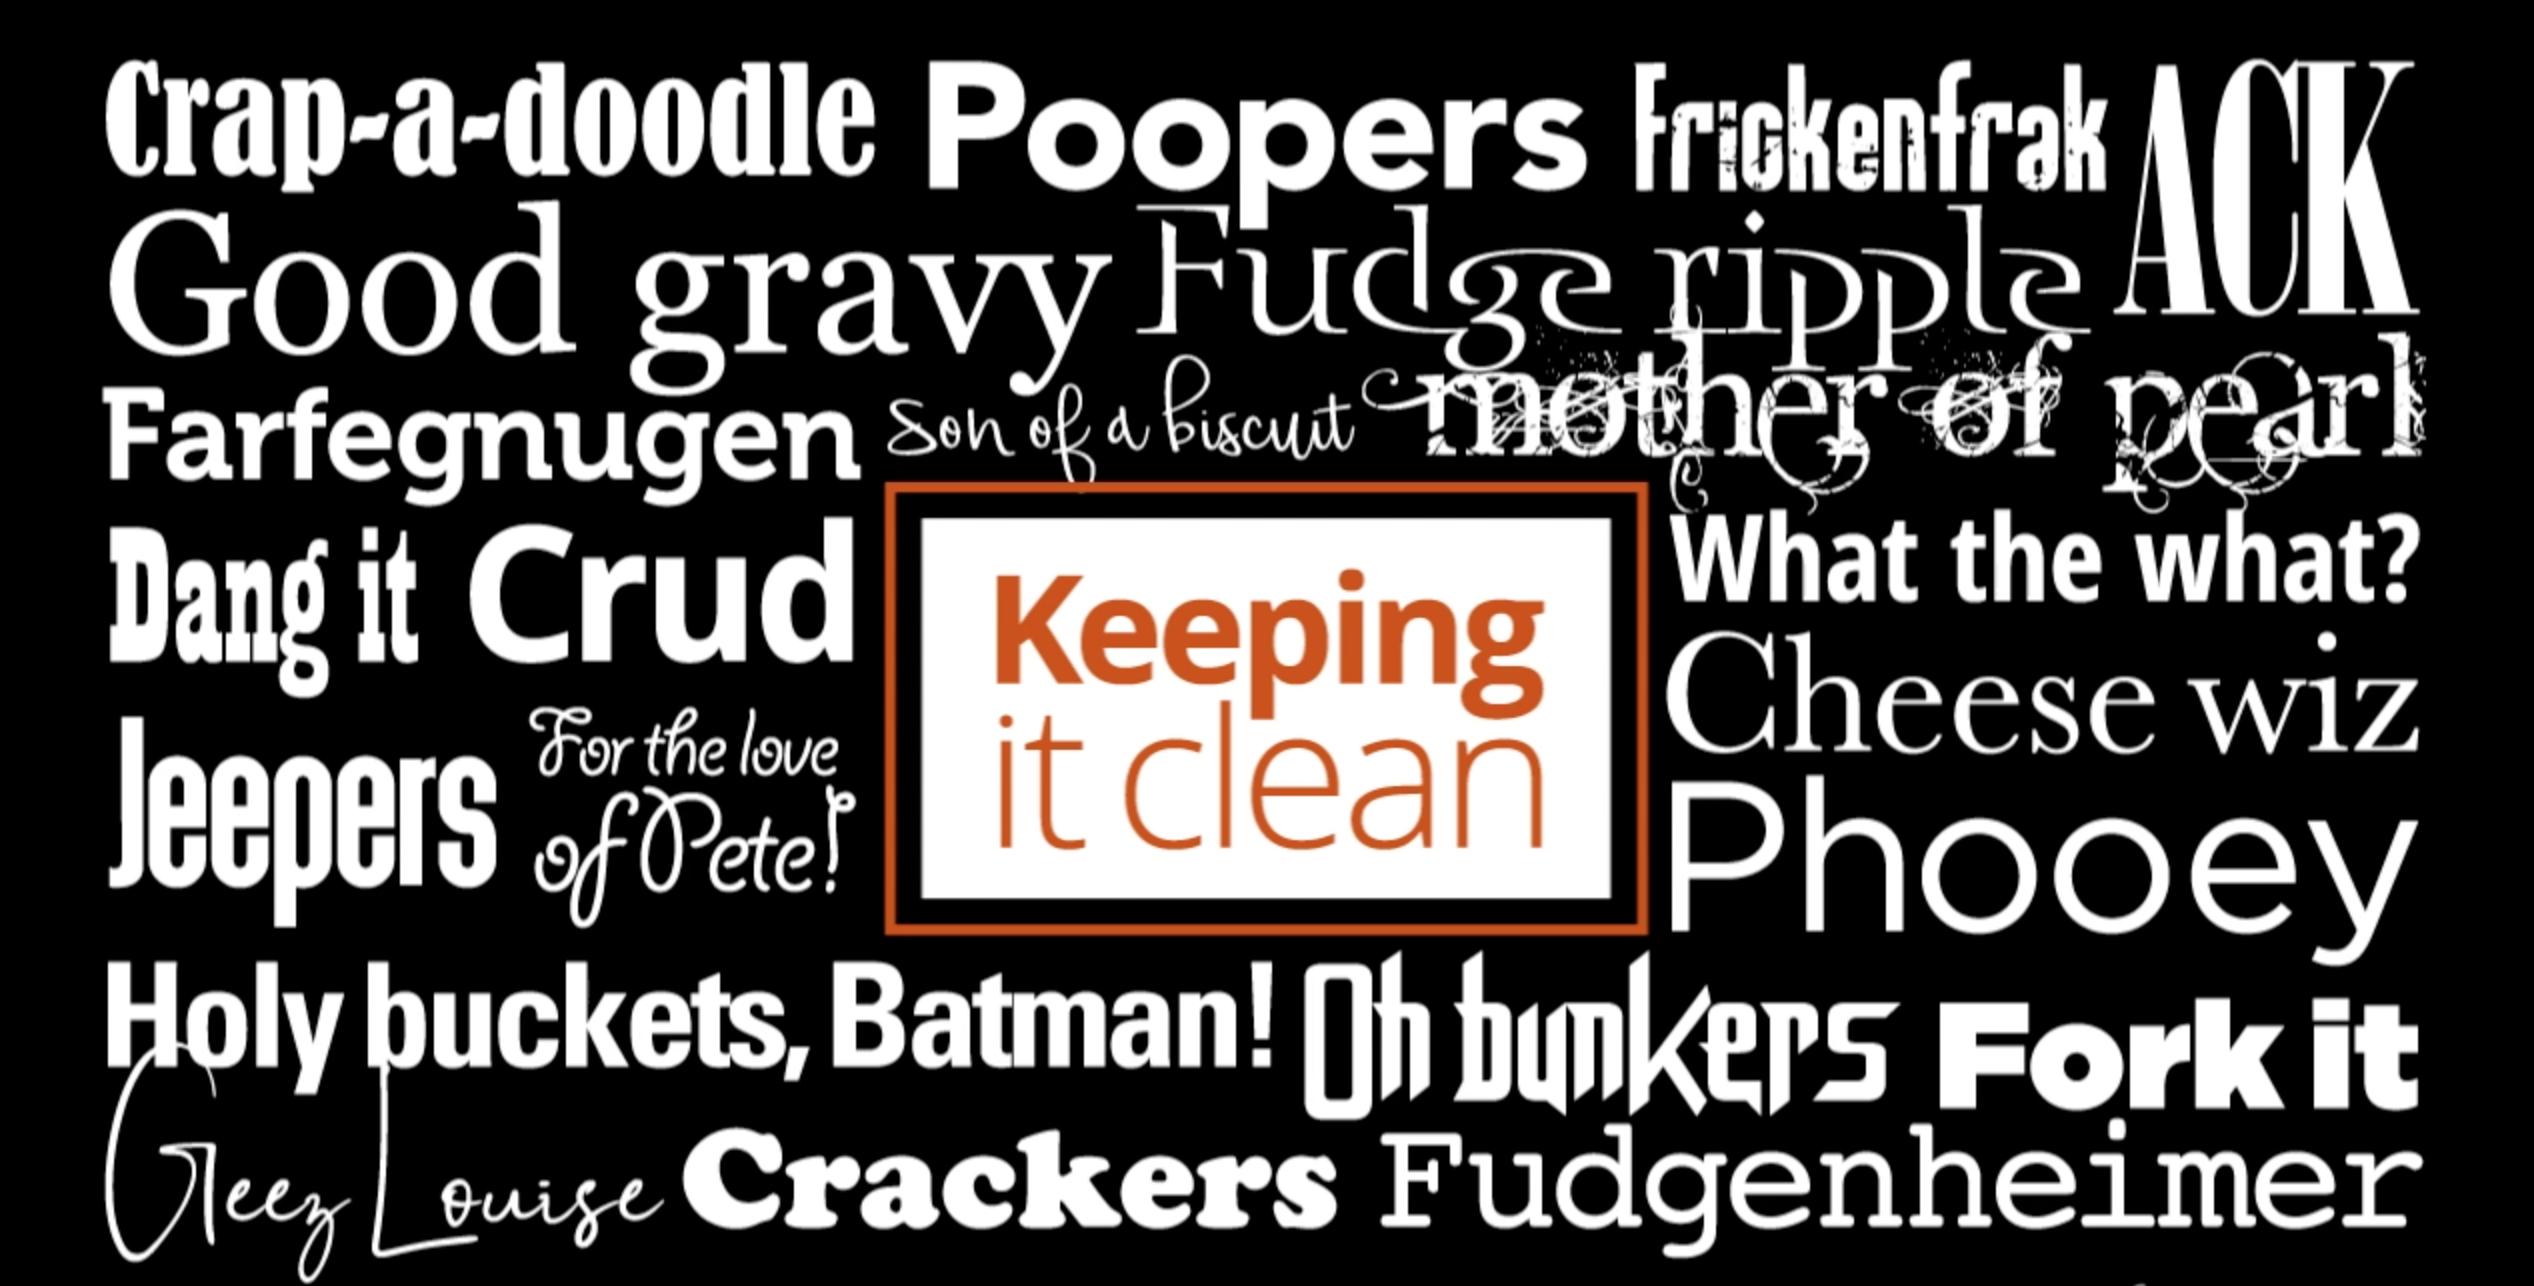 Keeping It Clean Smith Communication Partners Keep It Cleaner Cleaning Good Gravy 3 ответов 4 ретвитов 17 отметок «нравится». pinterest